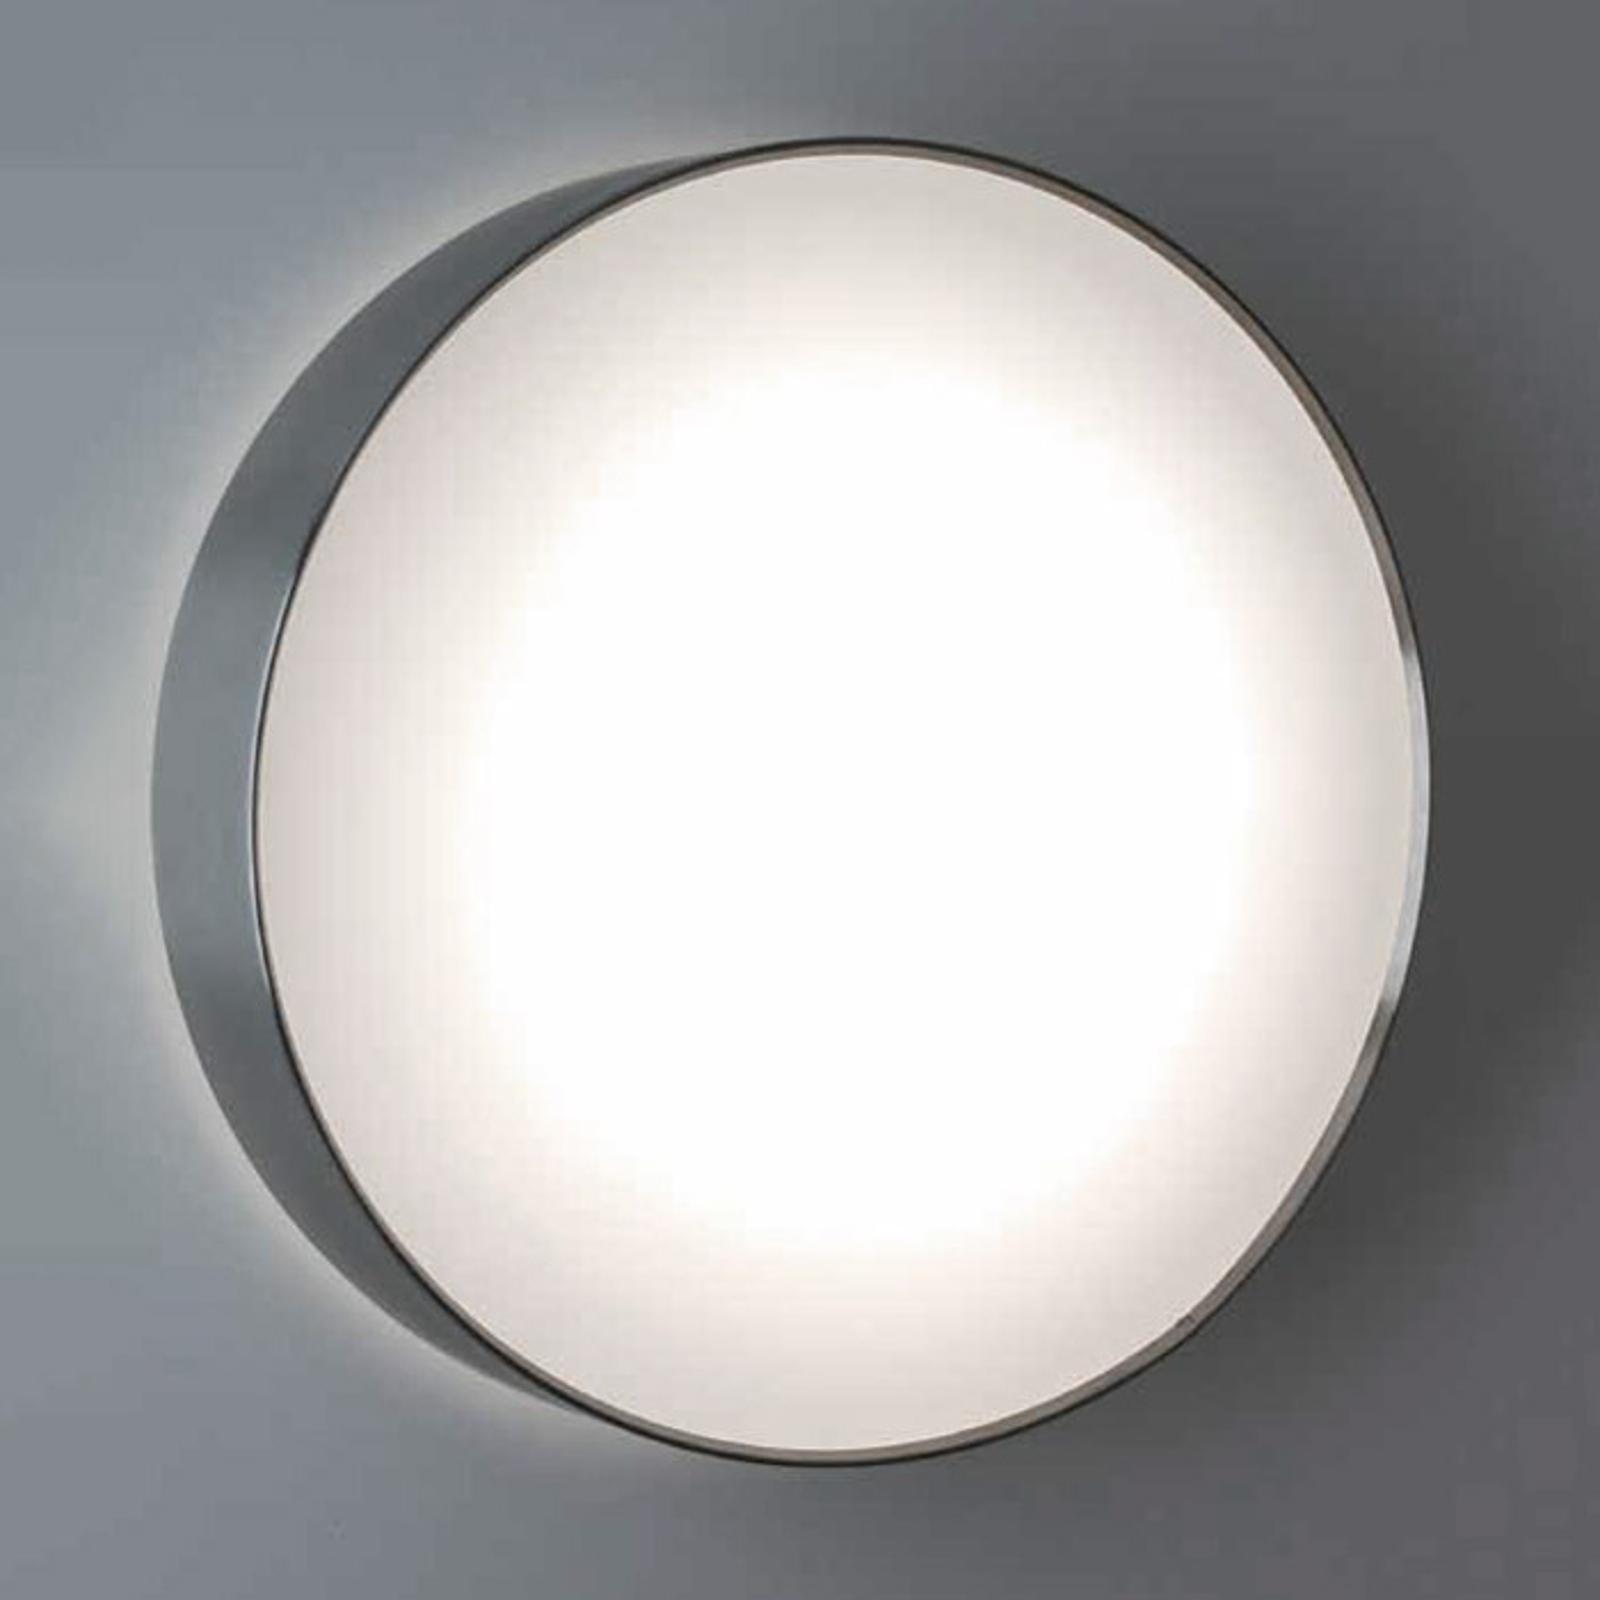 SUN 4 LED - plafonnier inox 9 W 4 k